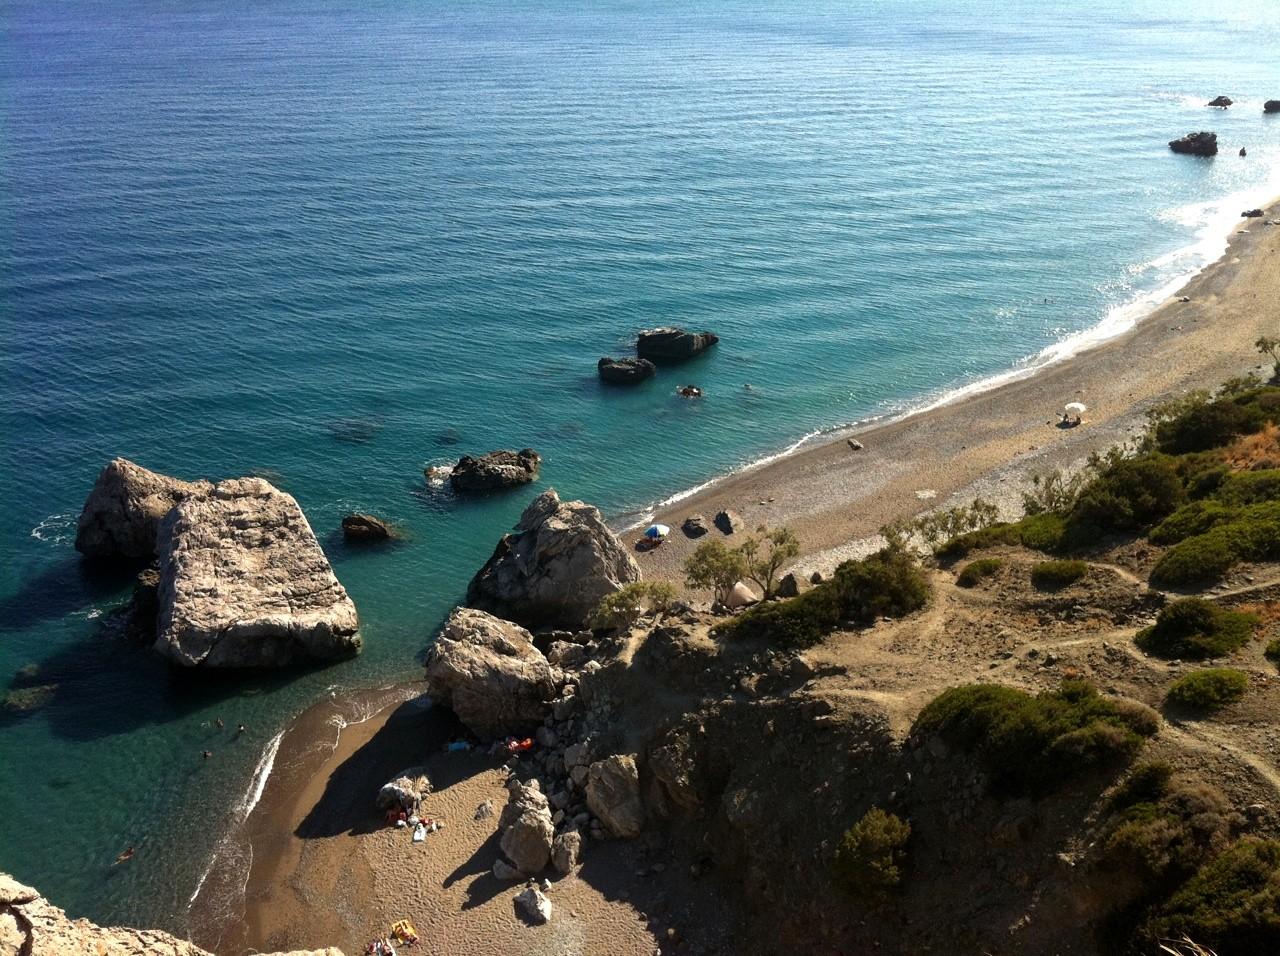 keratokambos beach crete, art gallery savvas petrakis viannos crete, viannos gallery savas petrakis, art in south heraklion crete, art gallery vianos crete, modern Art Gallery in Crete